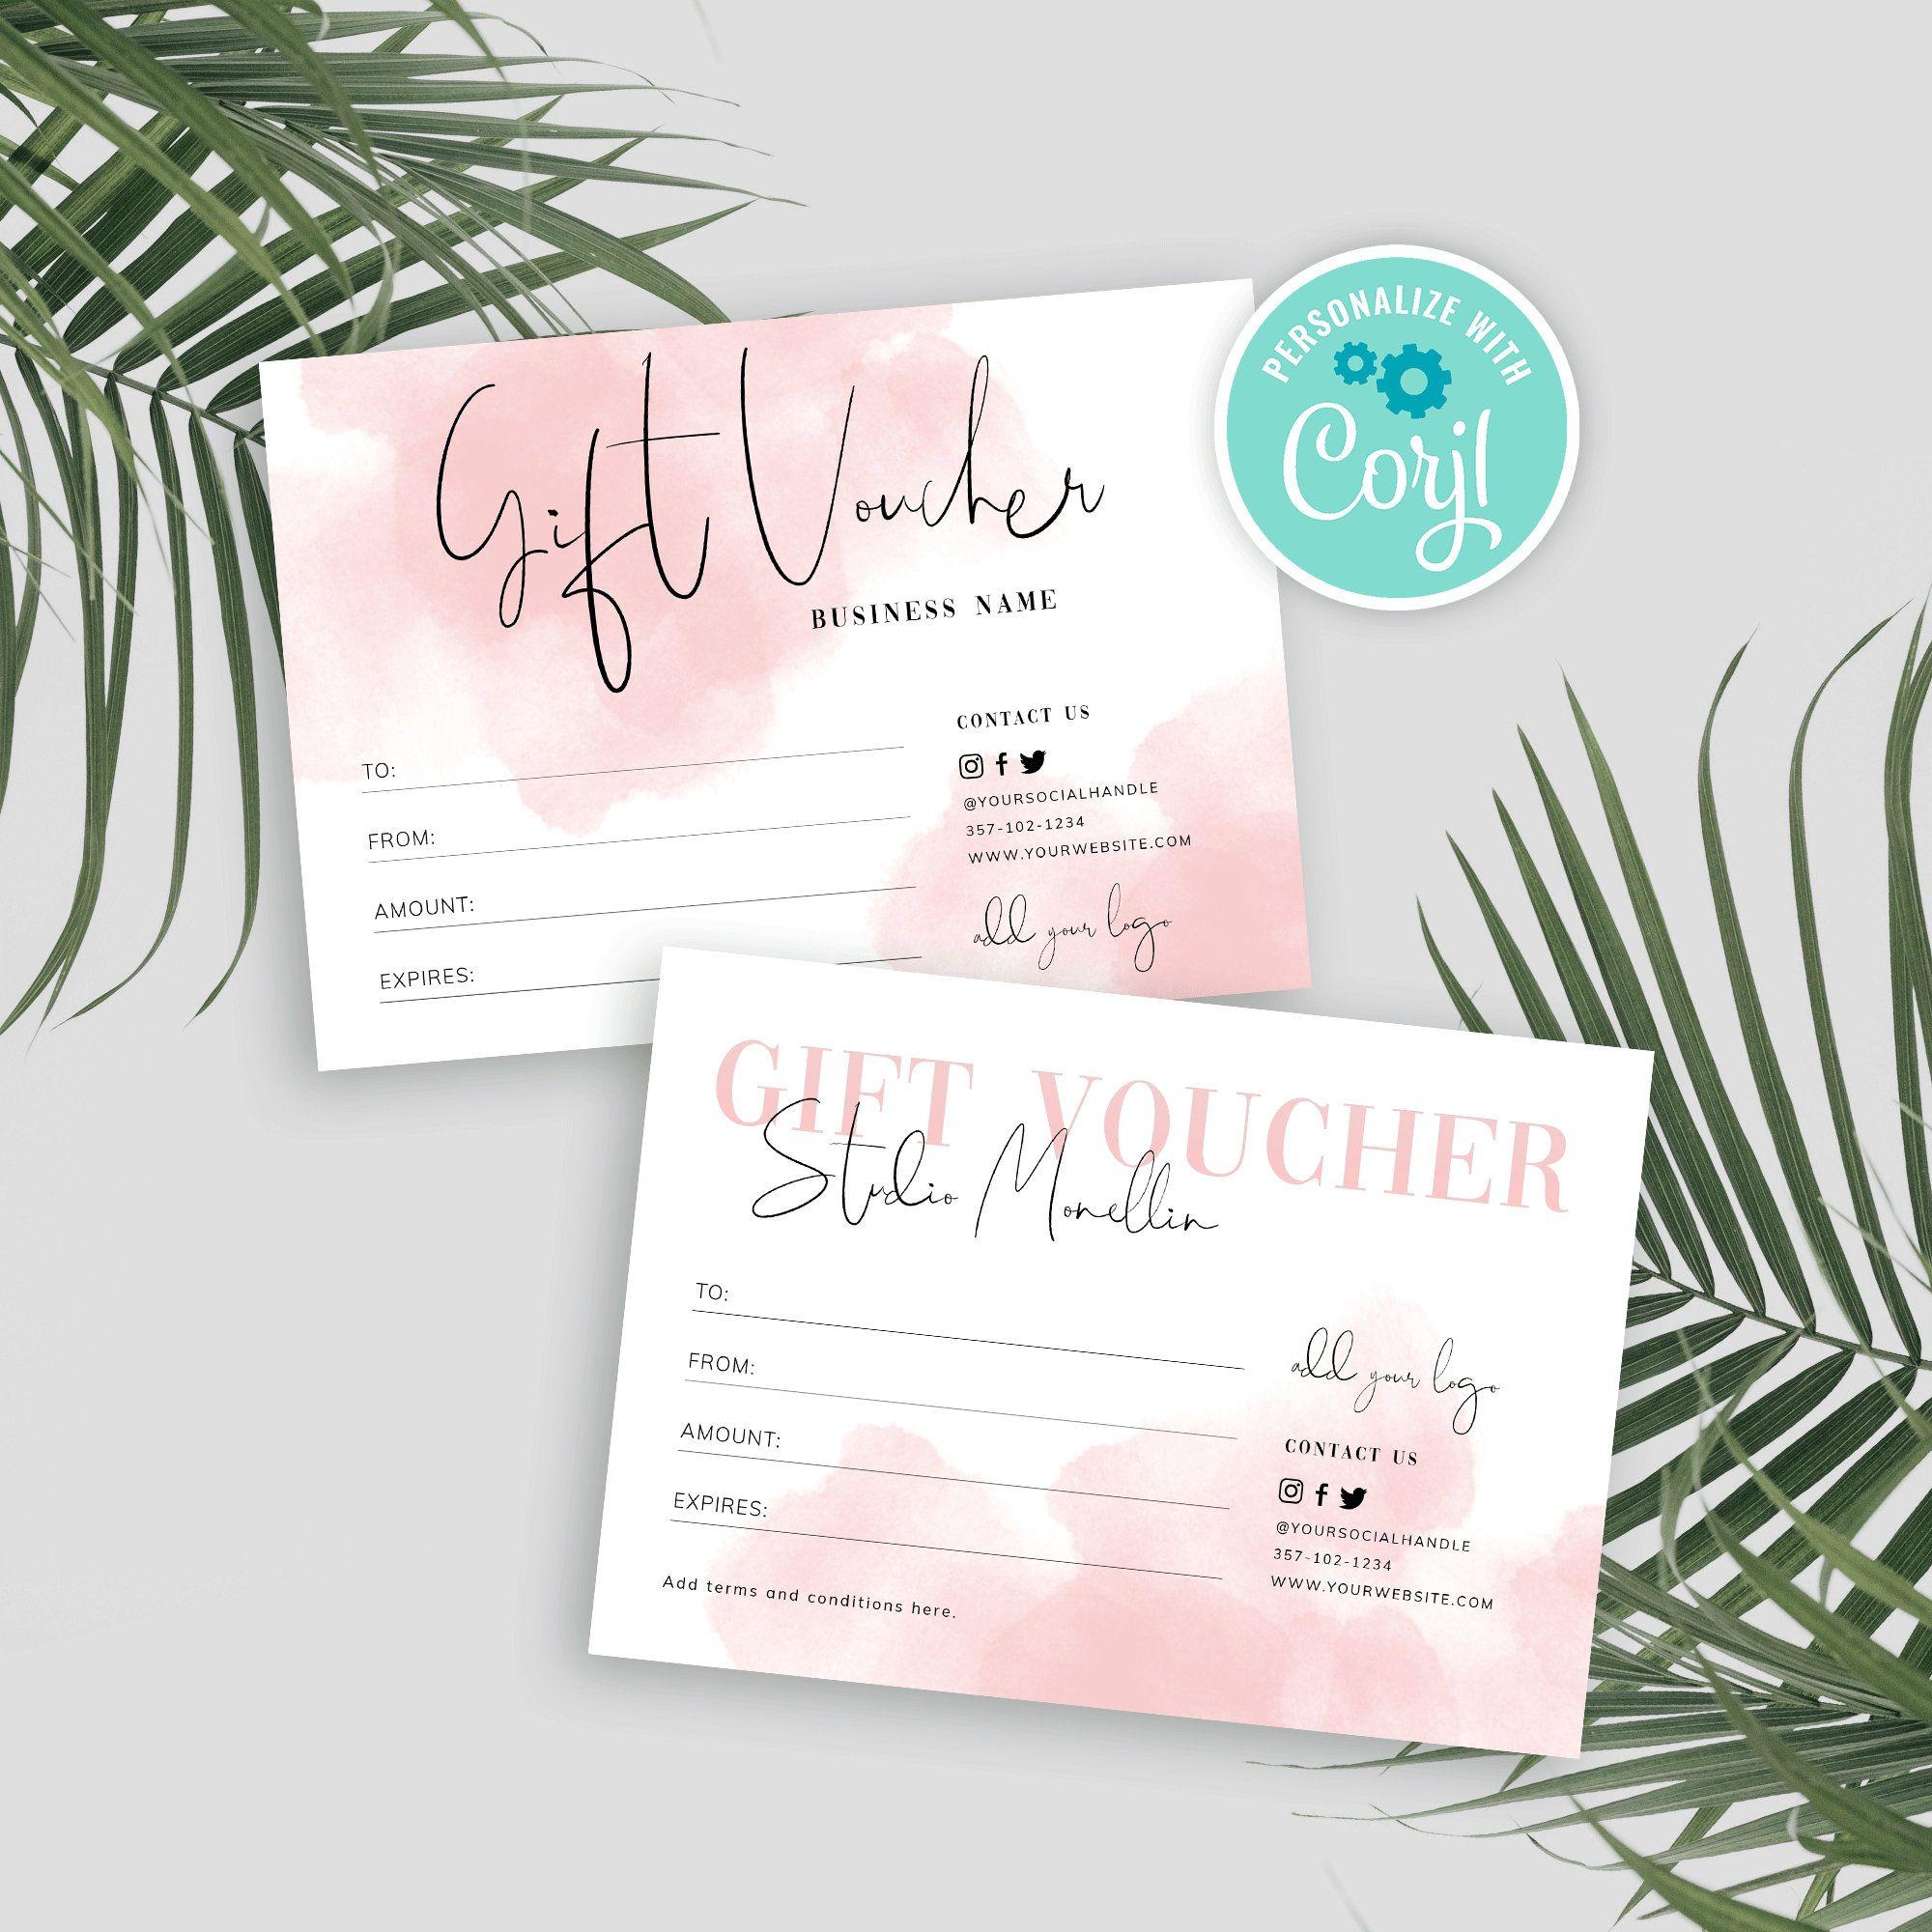 Printable Gift Voucher Design Editable Gift Certificate Etsy Salon Gift Card Certificate Design Template Gift Voucher Design